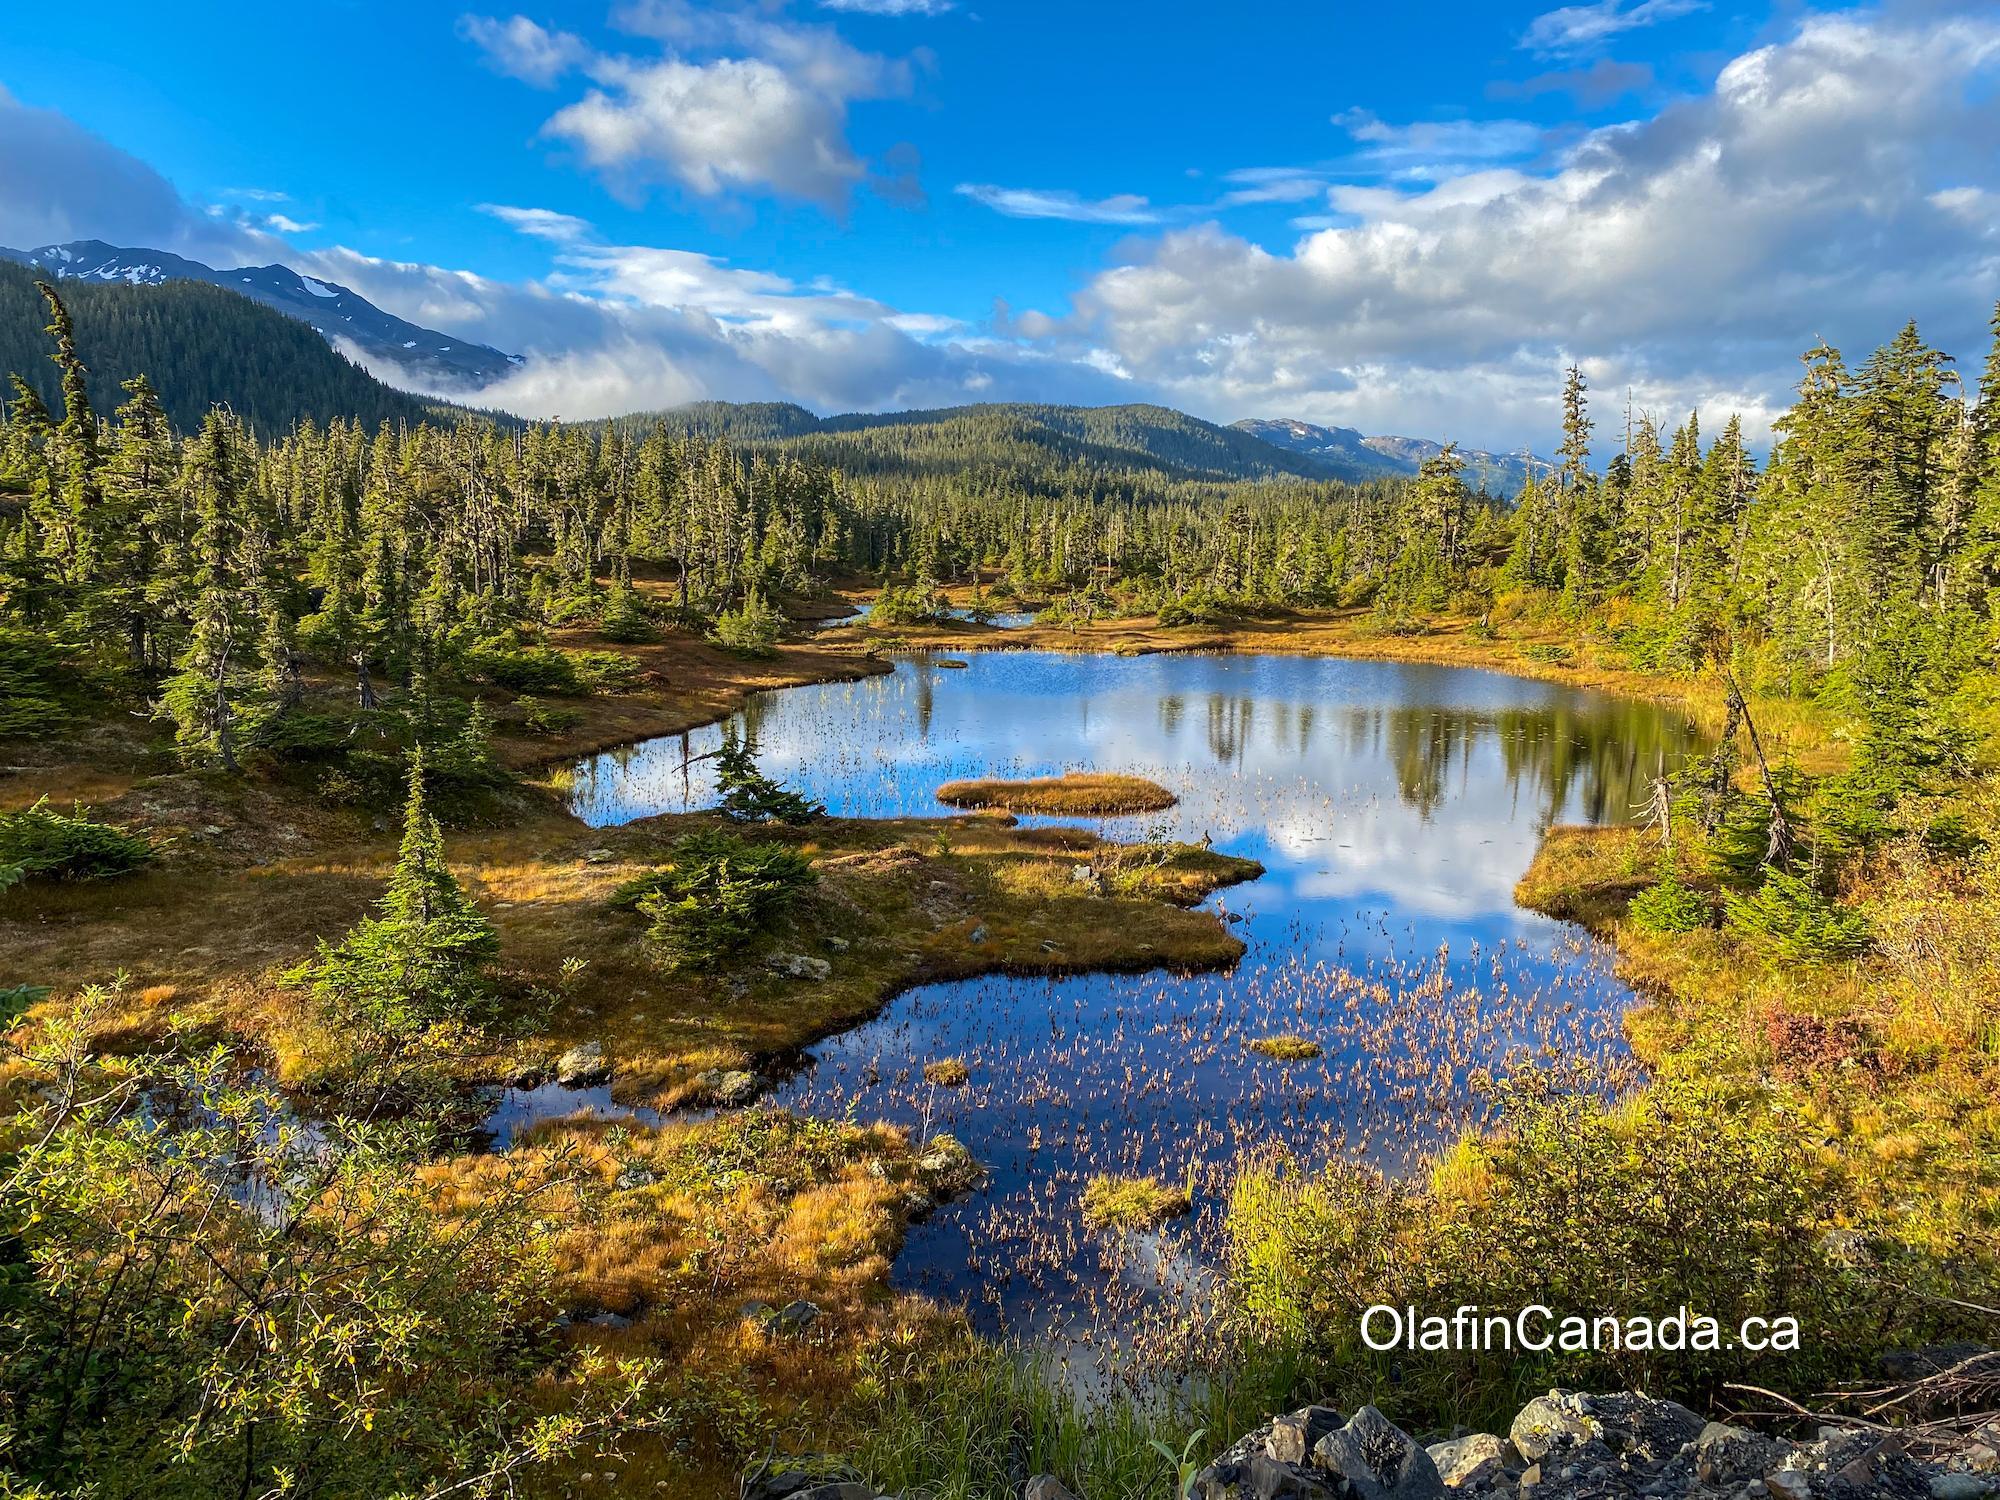 Mountain lake near Kitsault BC #olafincanada #britishcolumbia #discoverbc #kitsault #mountainlake